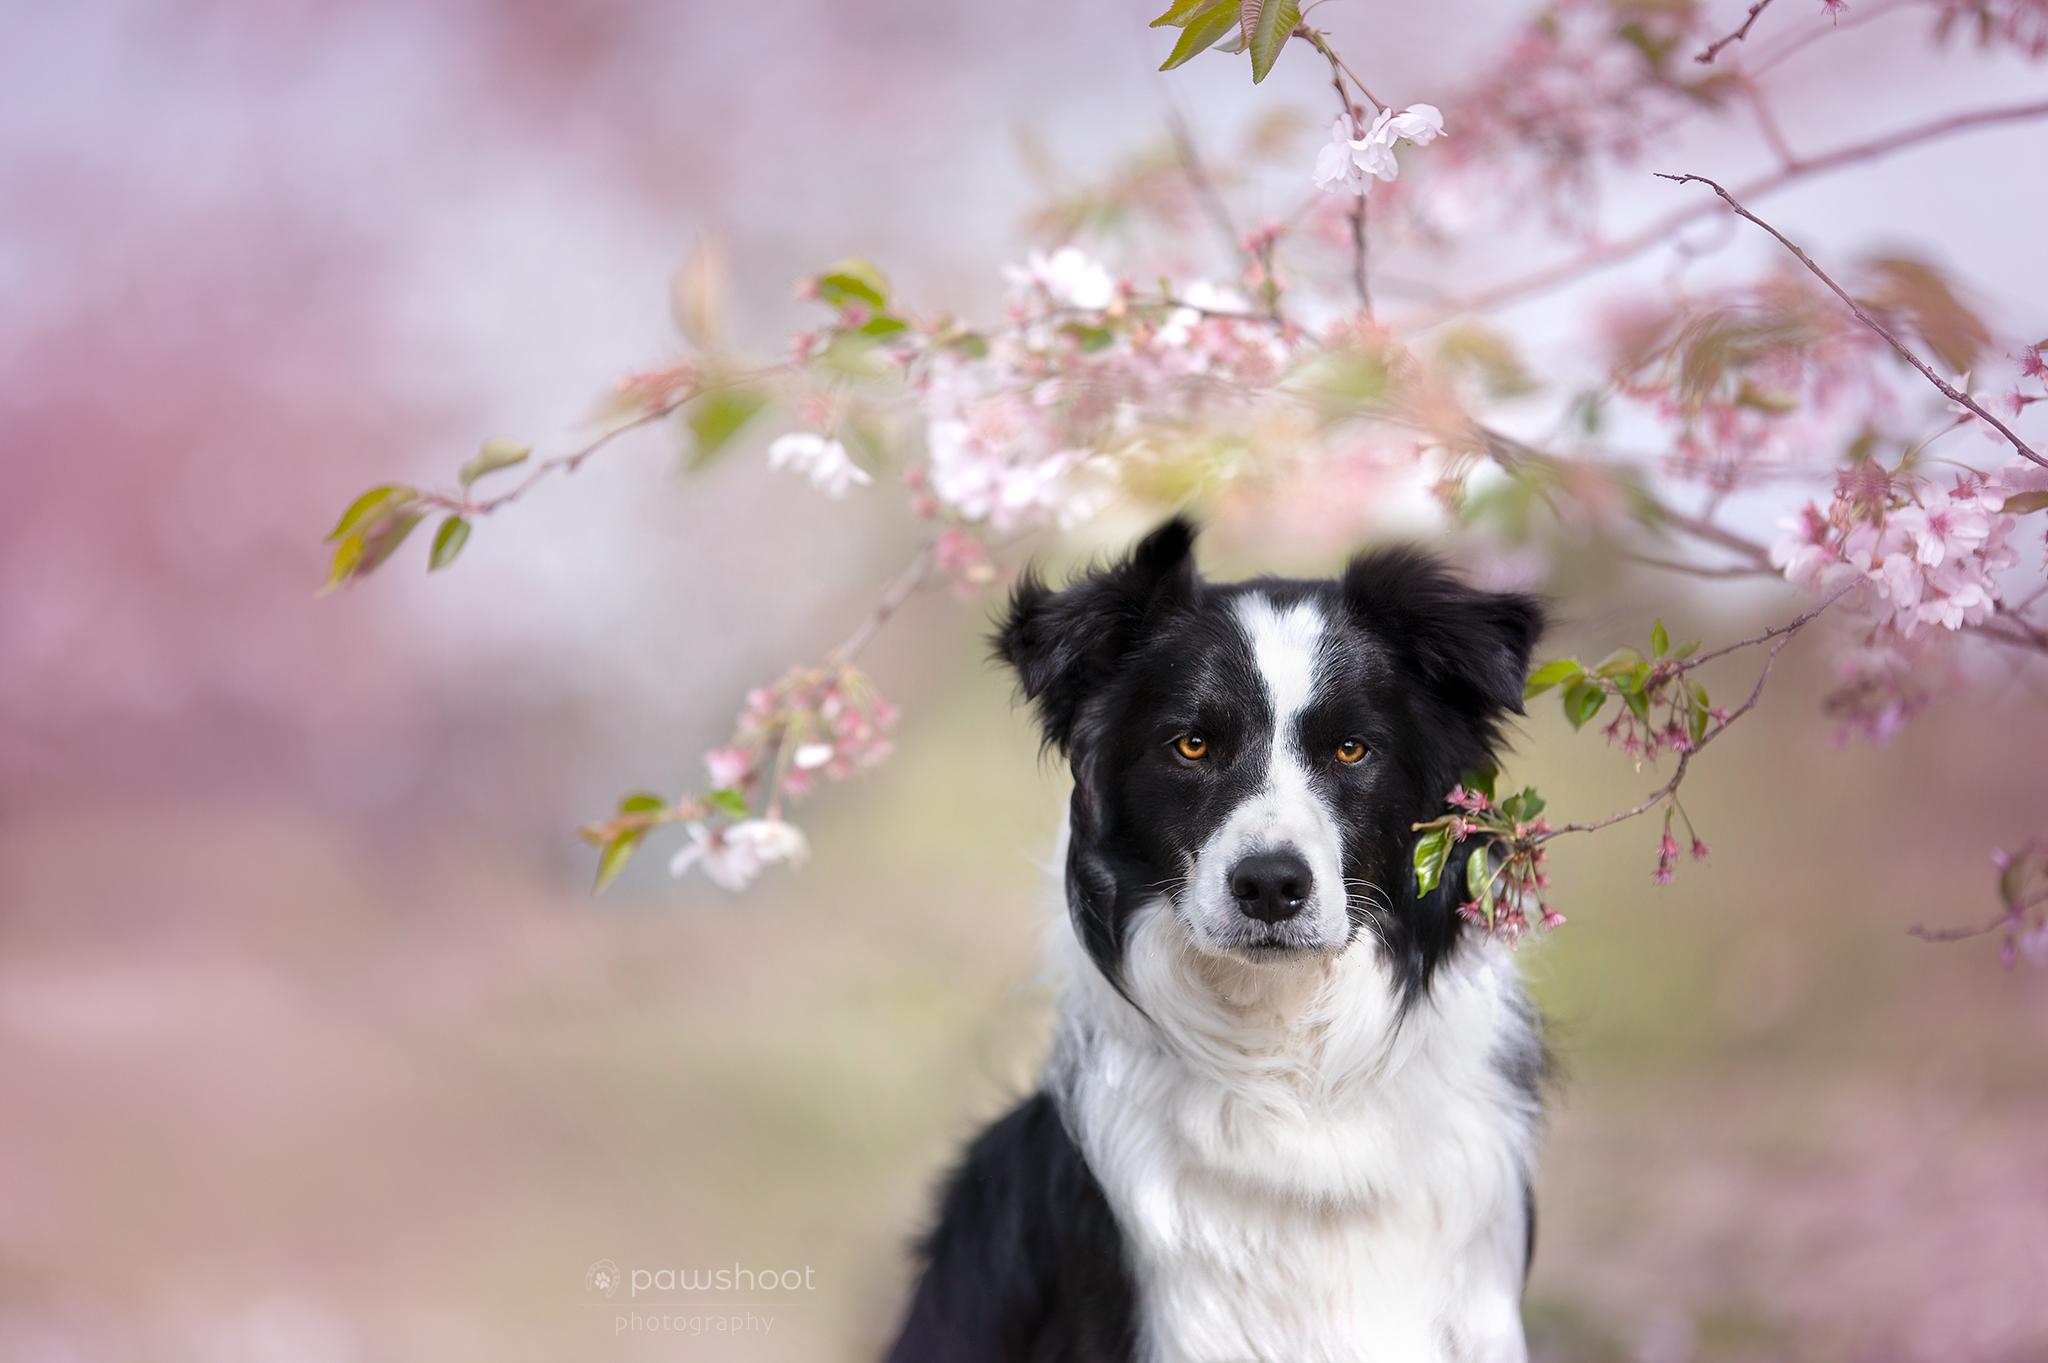 hond in bloesem Pawshoot hondenfotografie